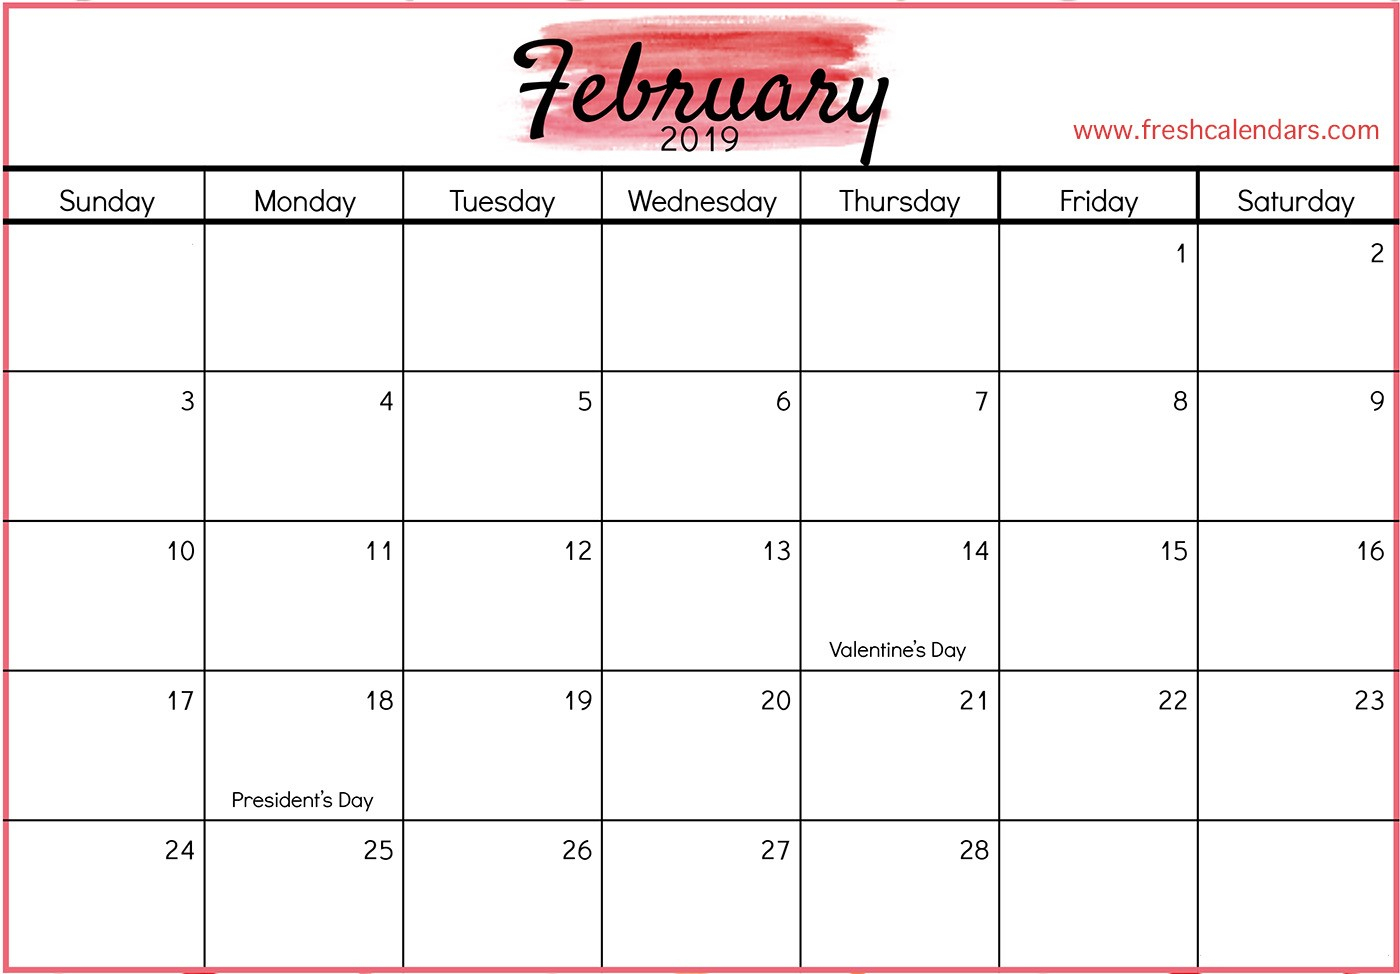 Free Printable February Calendars 2019 Blank February 2019 Calendar